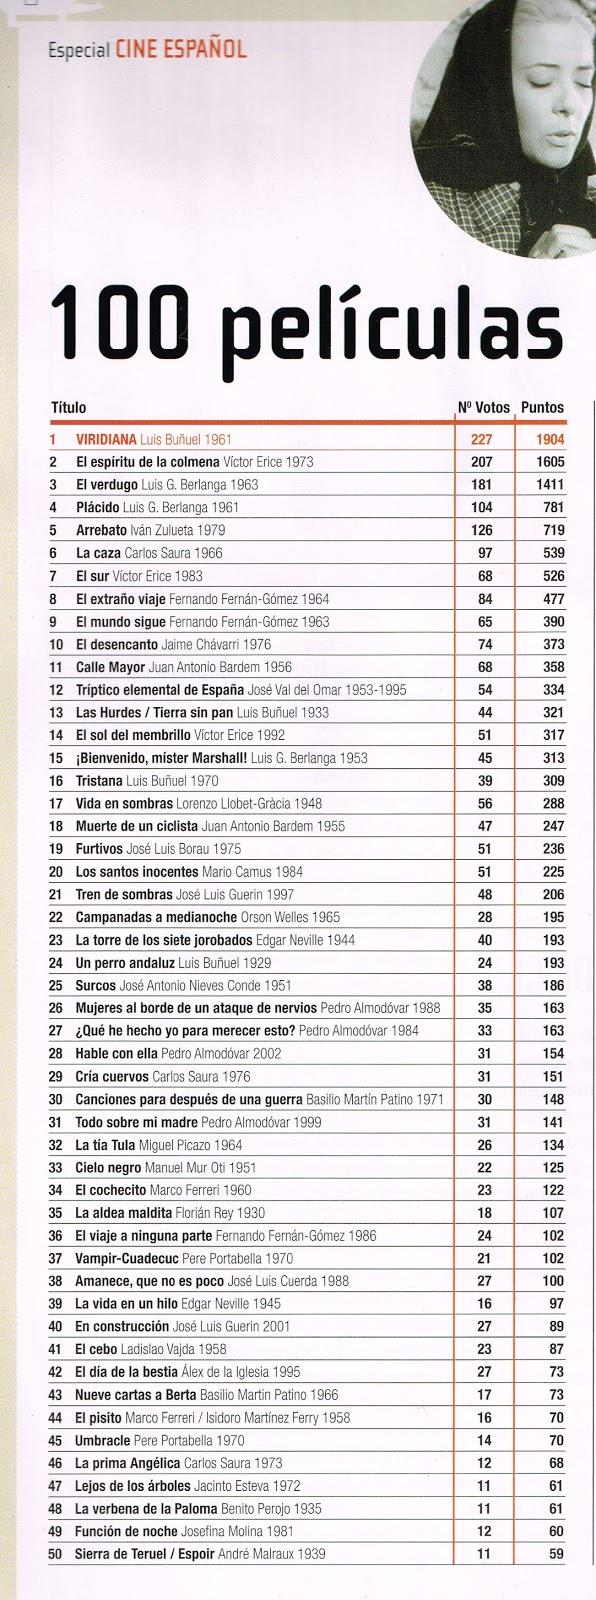 Marca España (a nuestro pesar) - Página 2 100%2Bmejores%2Bpel%25C3%25ADculas%2Bespa%25C3%25B1olas%2BCaim%25C3%25A1n%2Bmayo%2B2016%2B-%2Bcopia